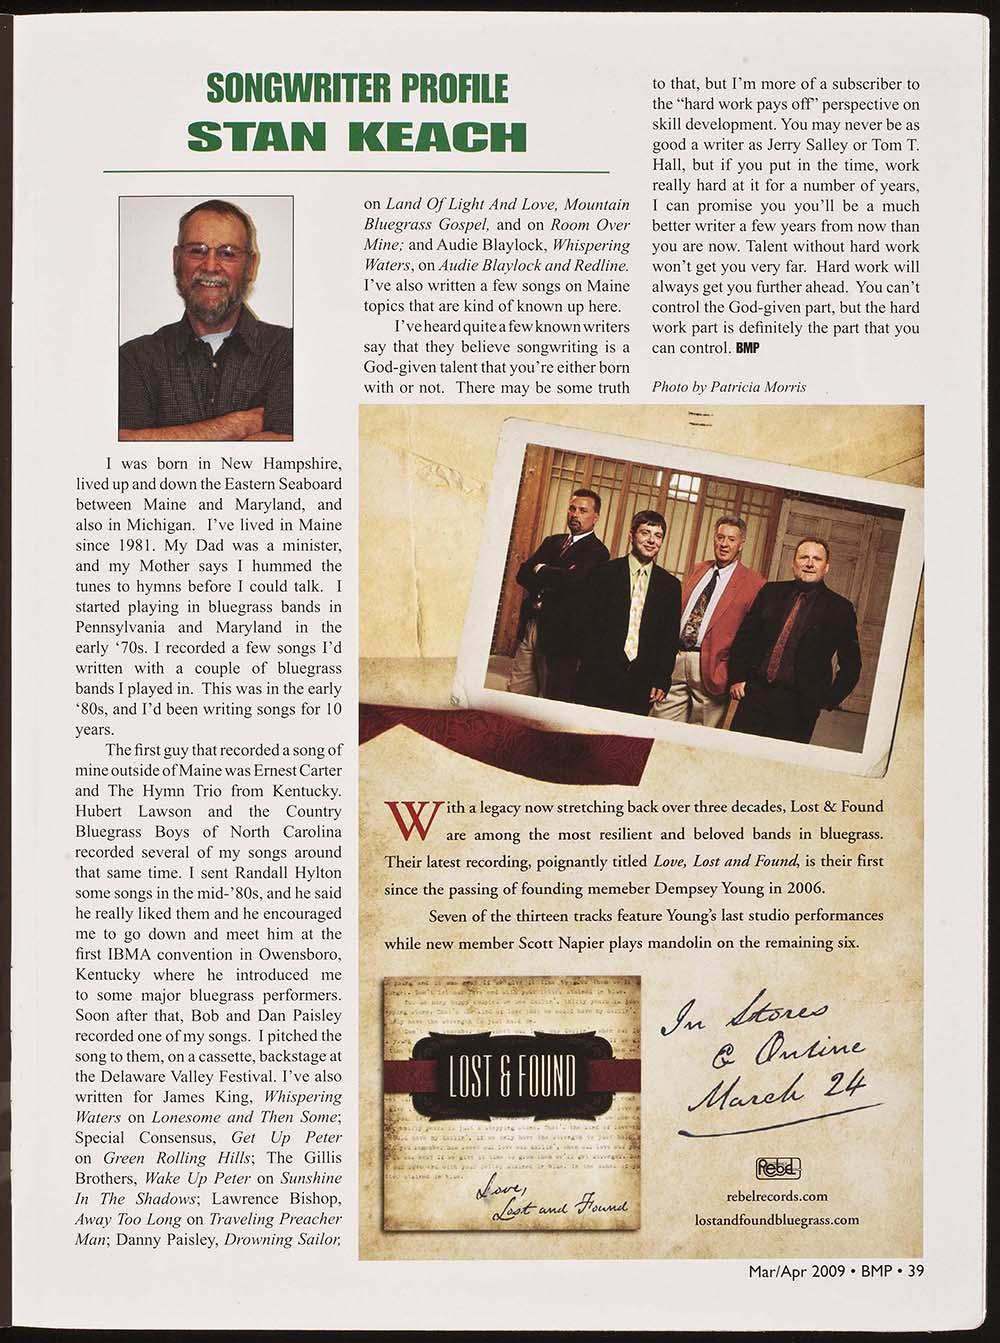 BIOG-1024, Stan Keach, Songwriter Profile, BMP Magazine, March-April 2009